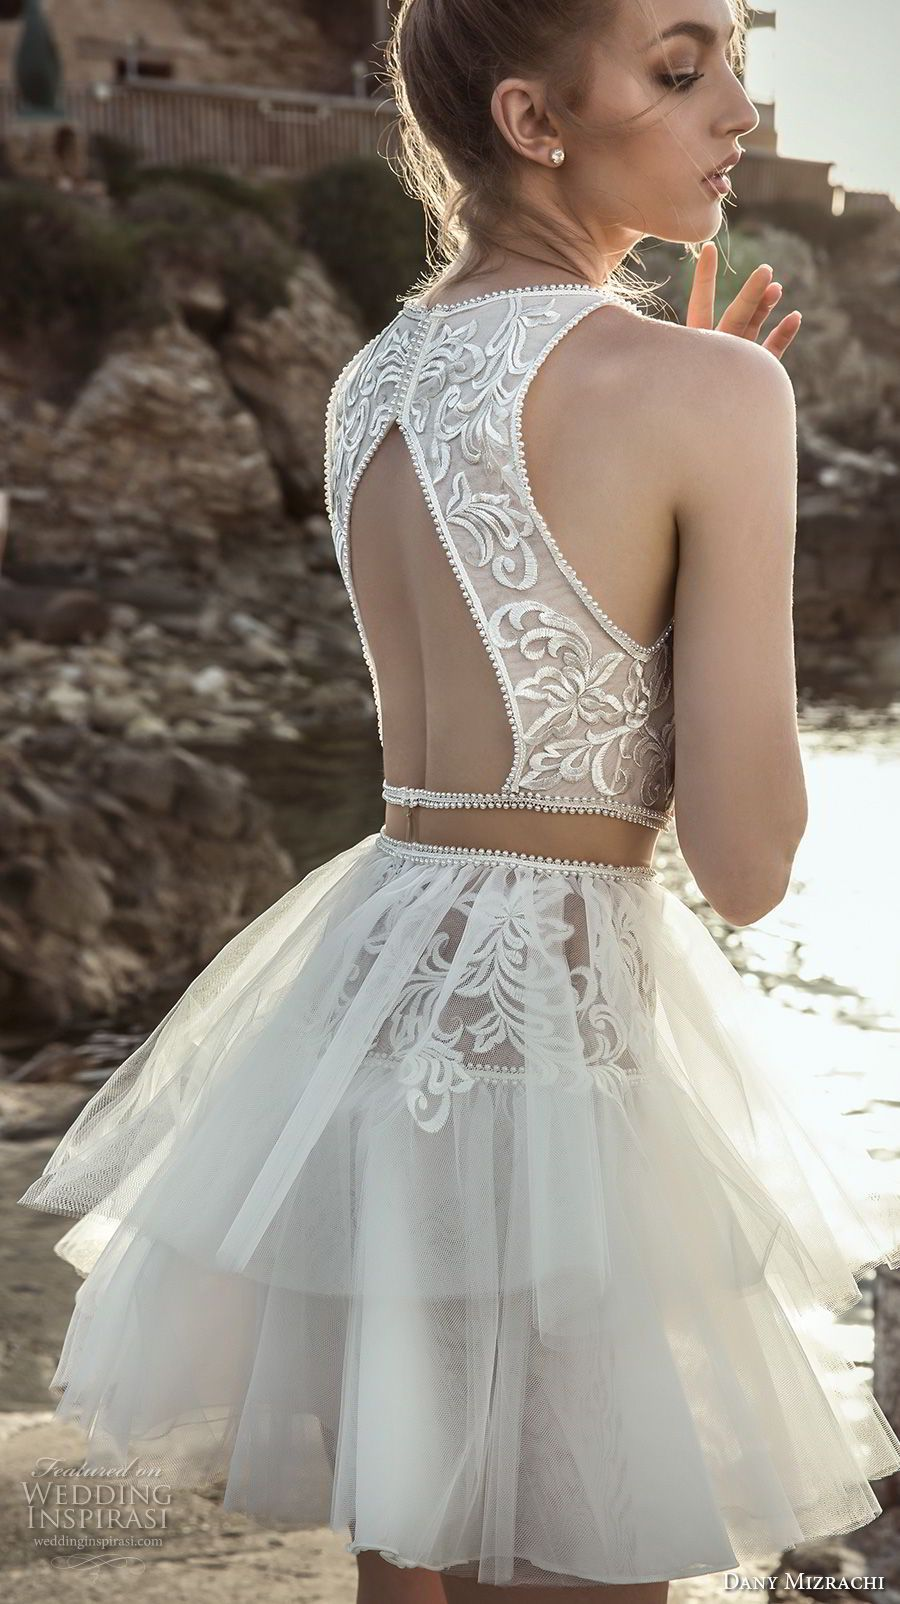 Dany mizrachi wedding dresses short wedding dresses tulle